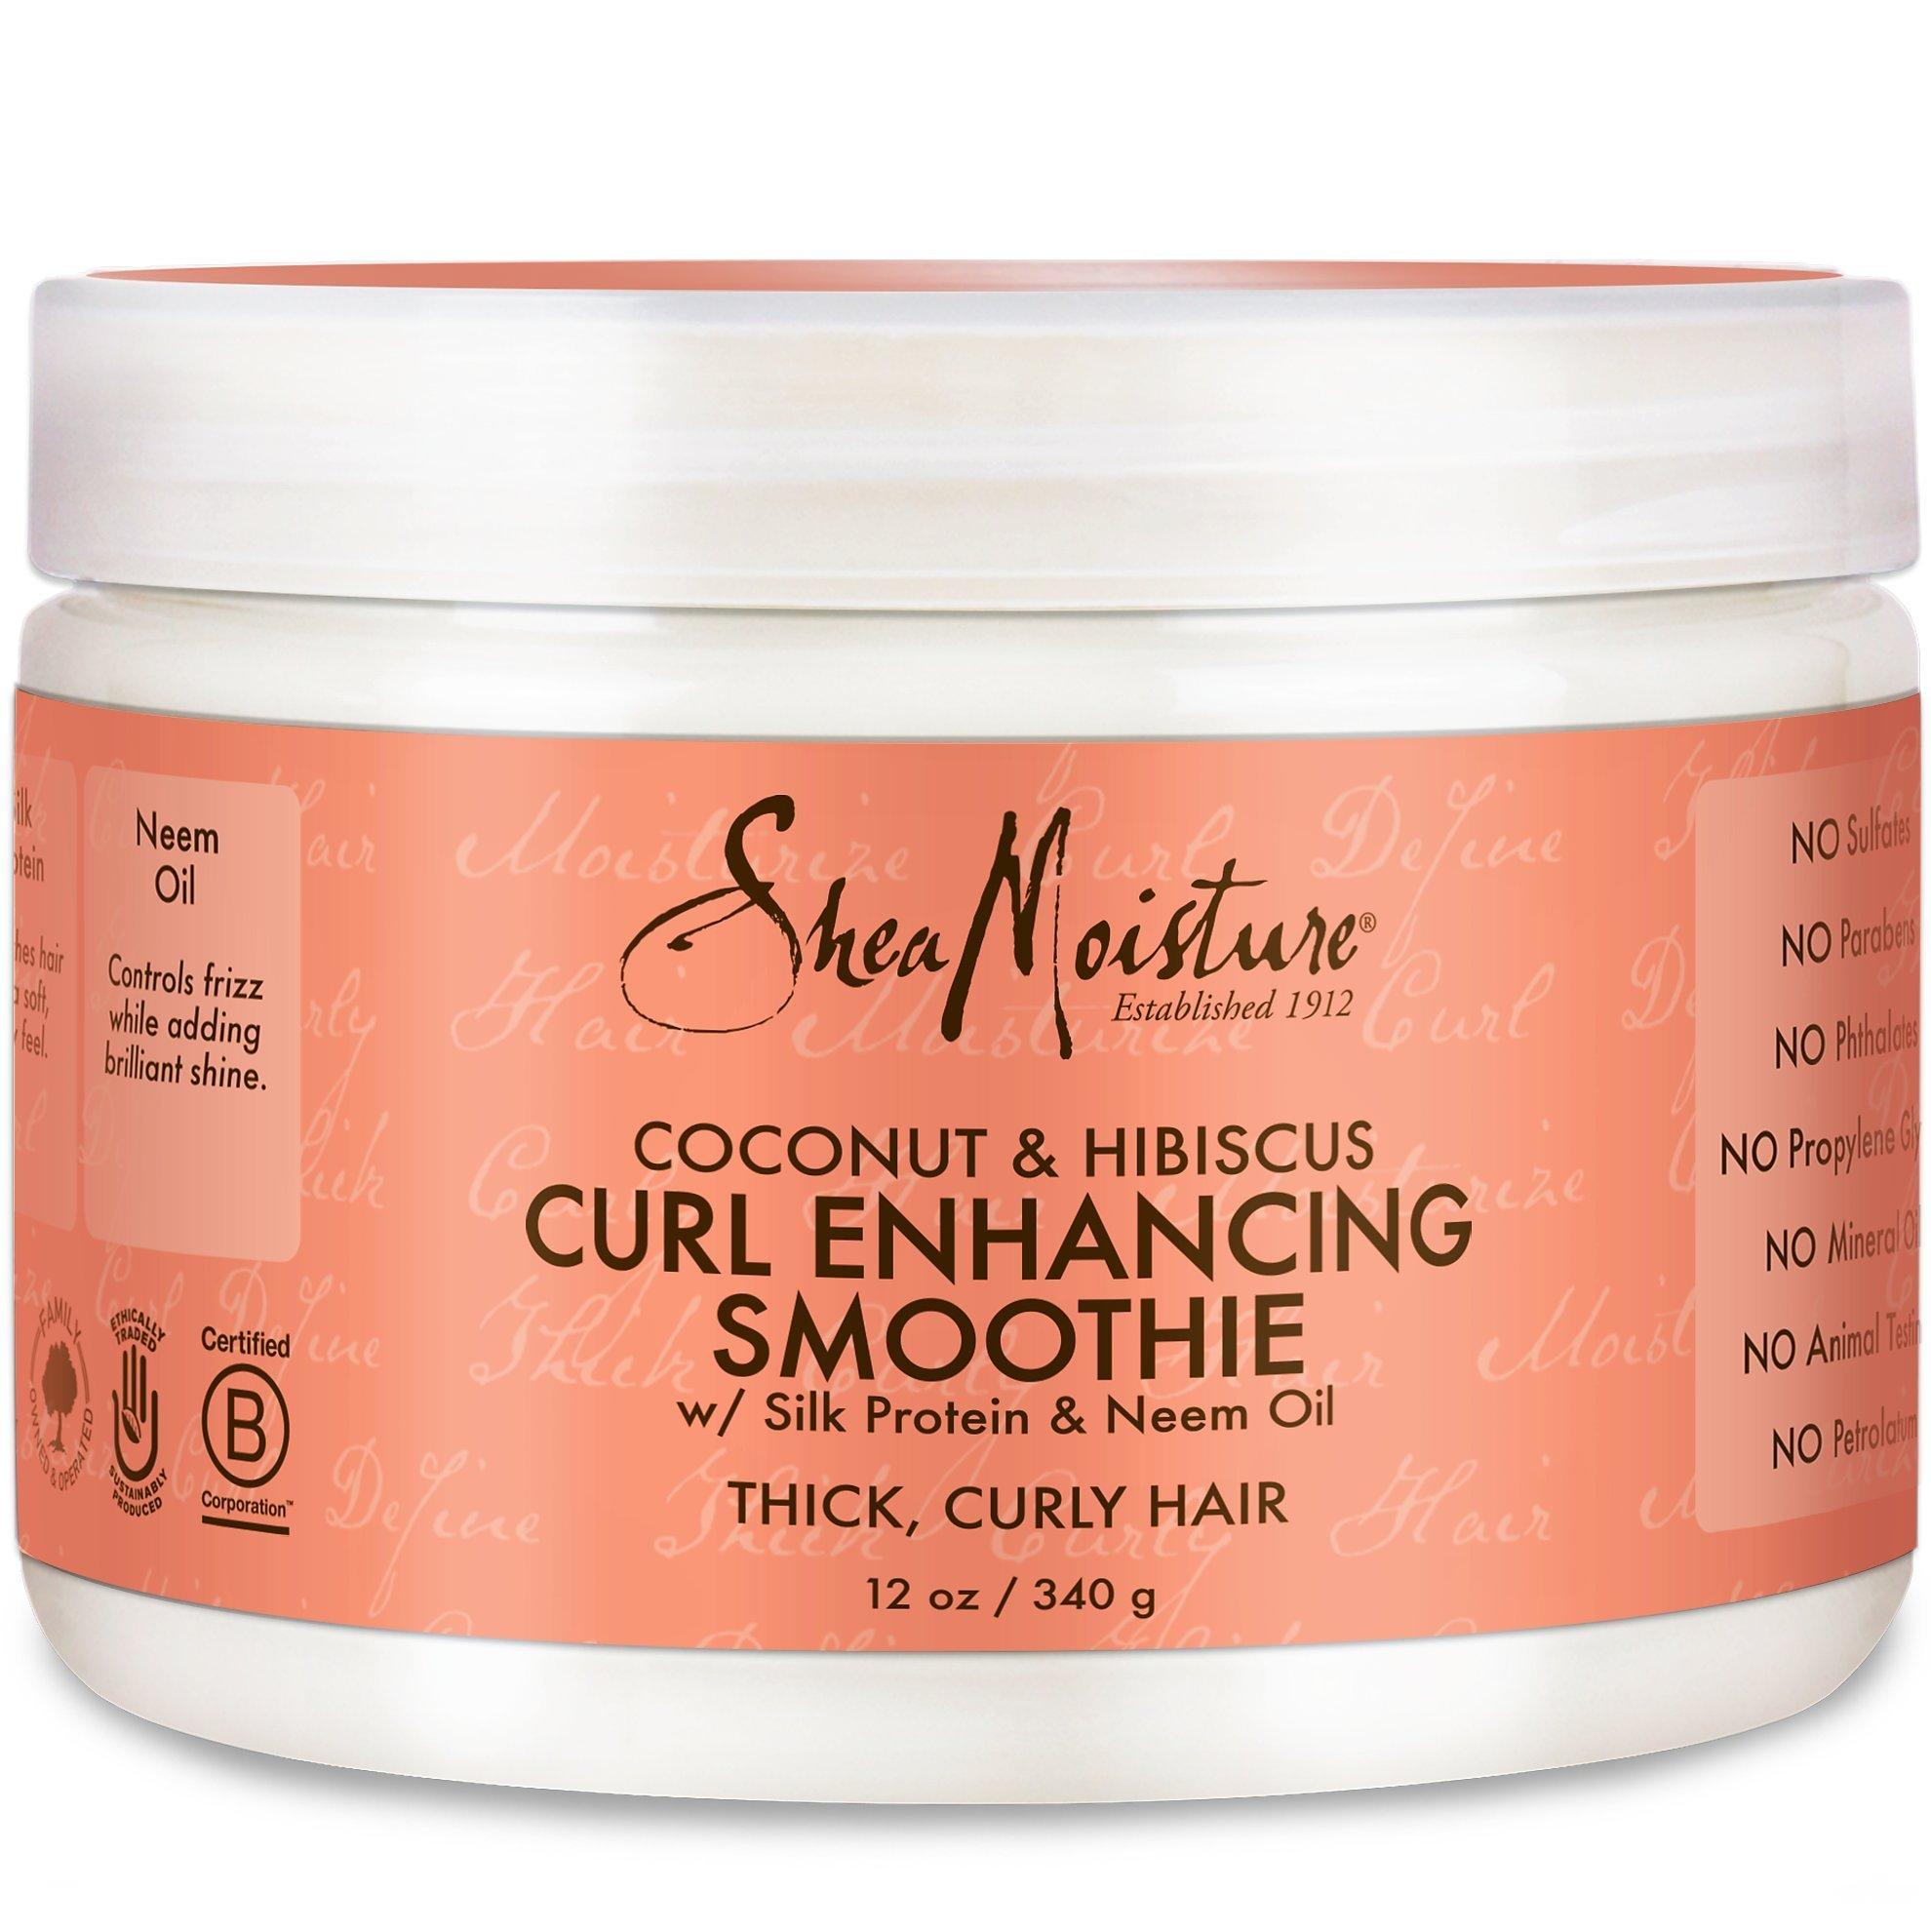 Shea Moisture Coconut Hibiscus Curl Enhancing Smoothie-12 oz by SHEA MOISTURE